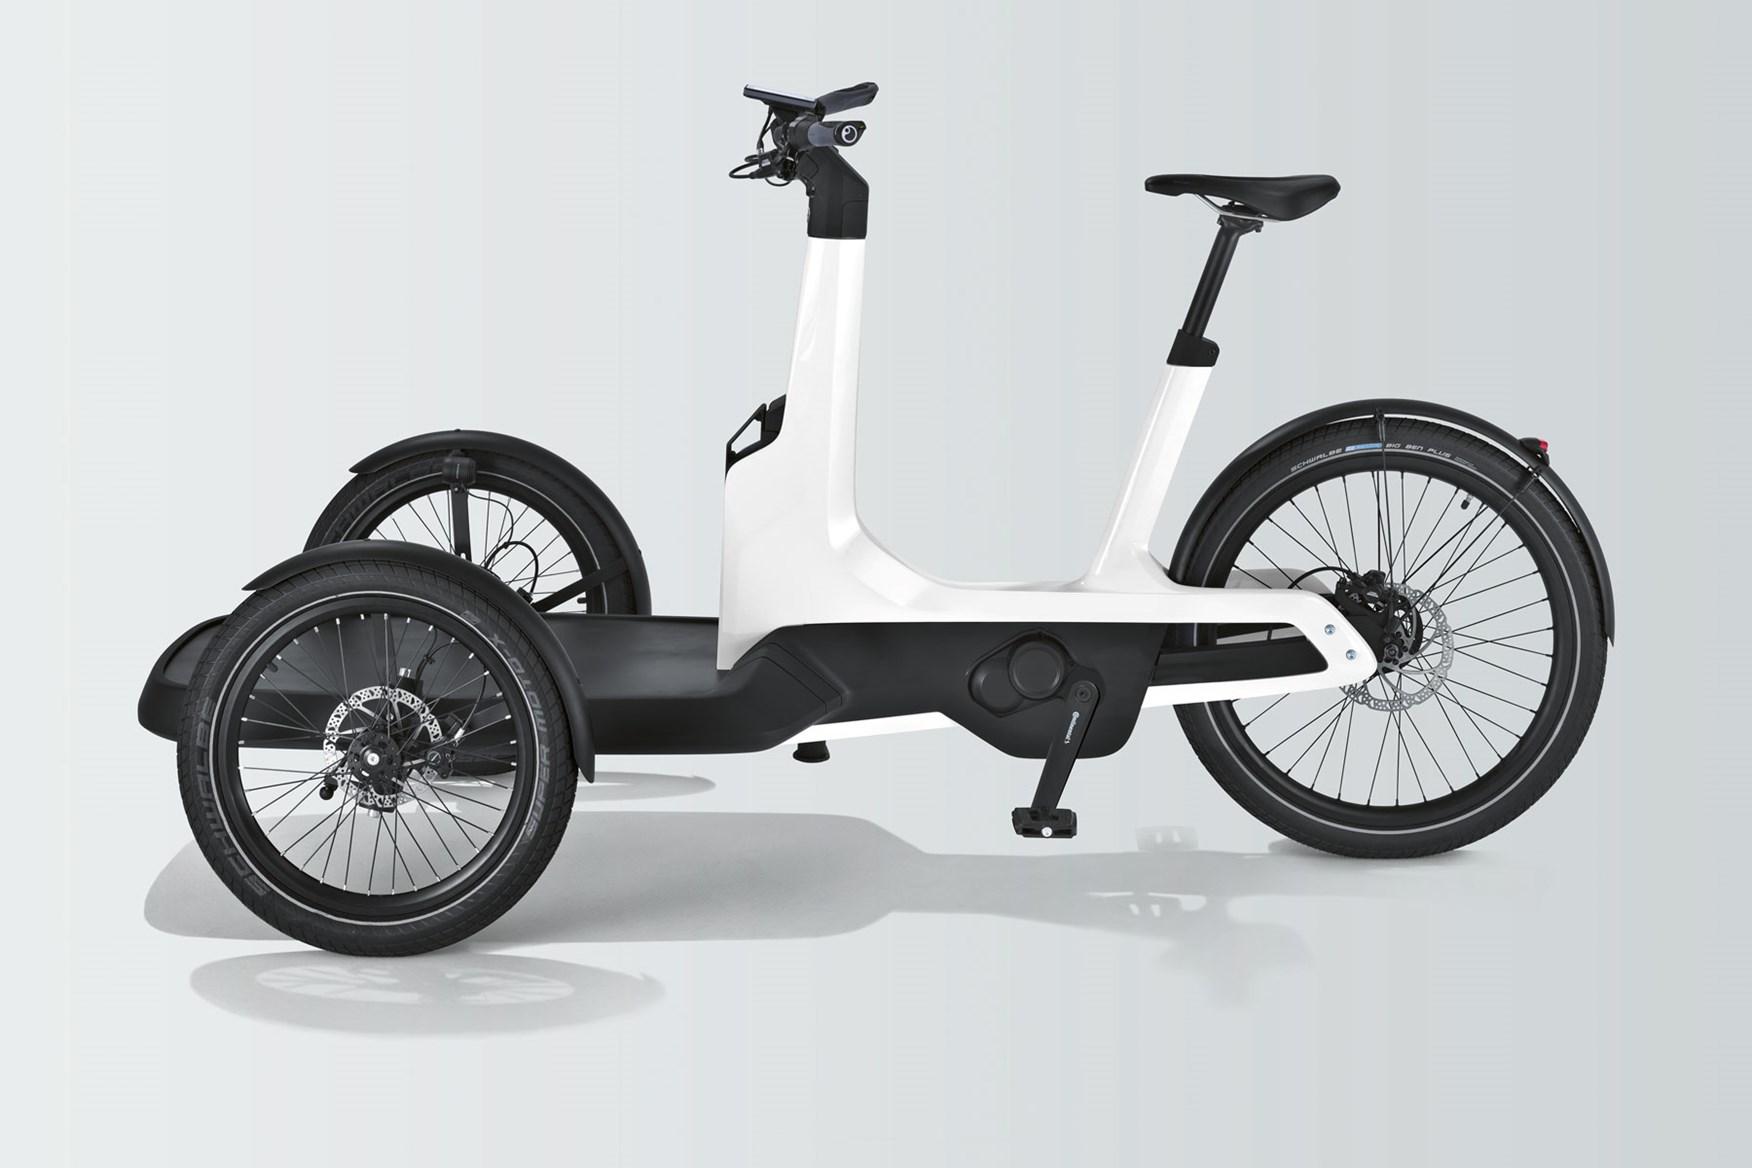 vw cargo e bike the ultimate eco friendly last mile delivery solution parkers. Black Bedroom Furniture Sets. Home Design Ideas